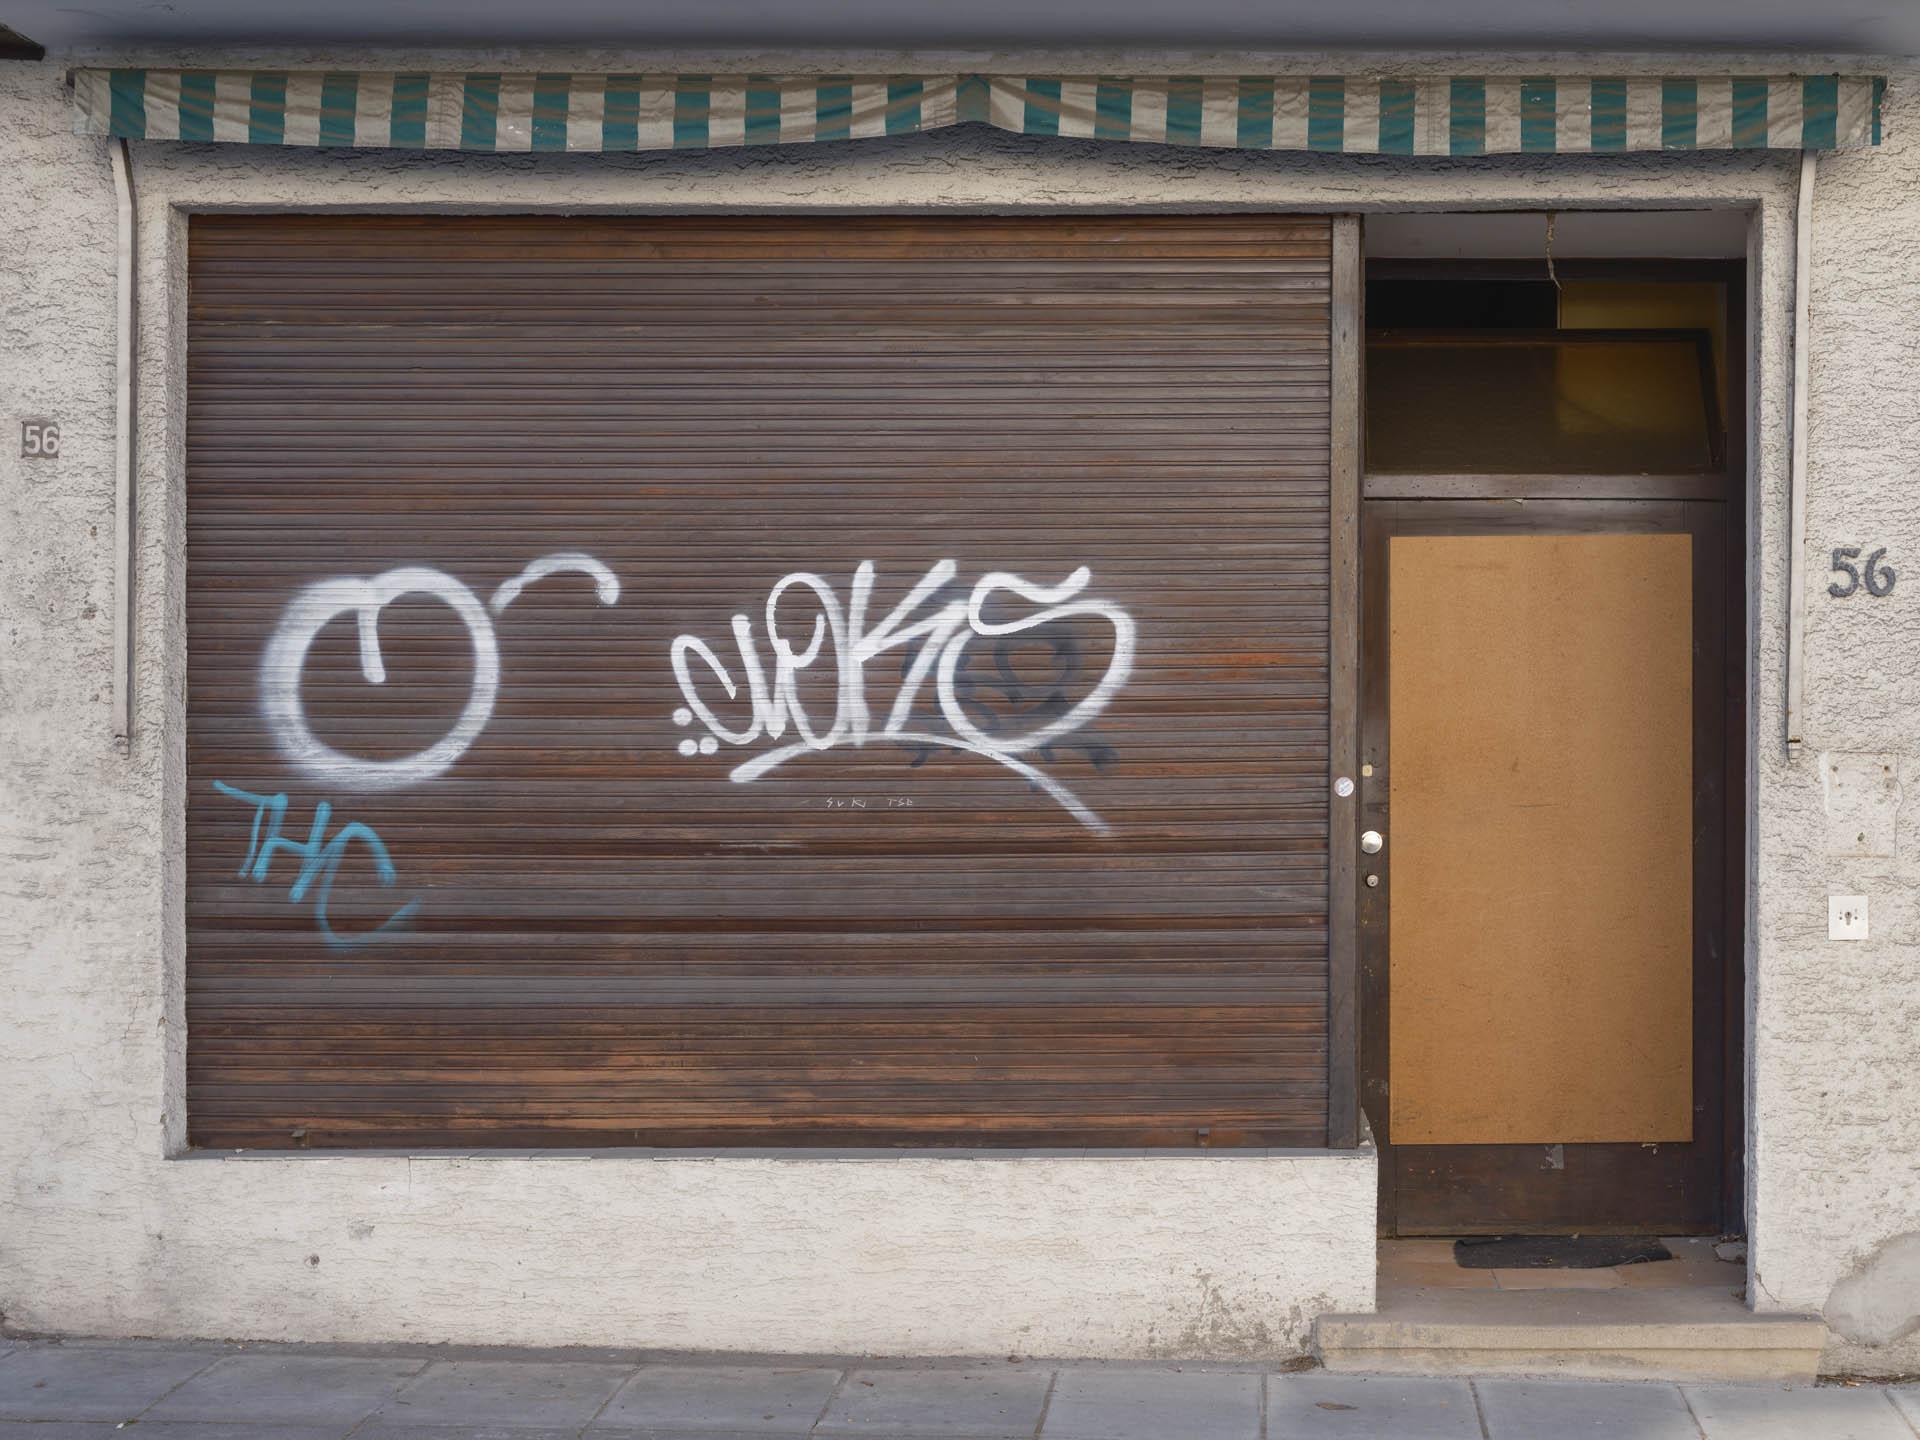 Freie Arbeit Architektur-Fotografie: Umwidmung IV / Rededication IV